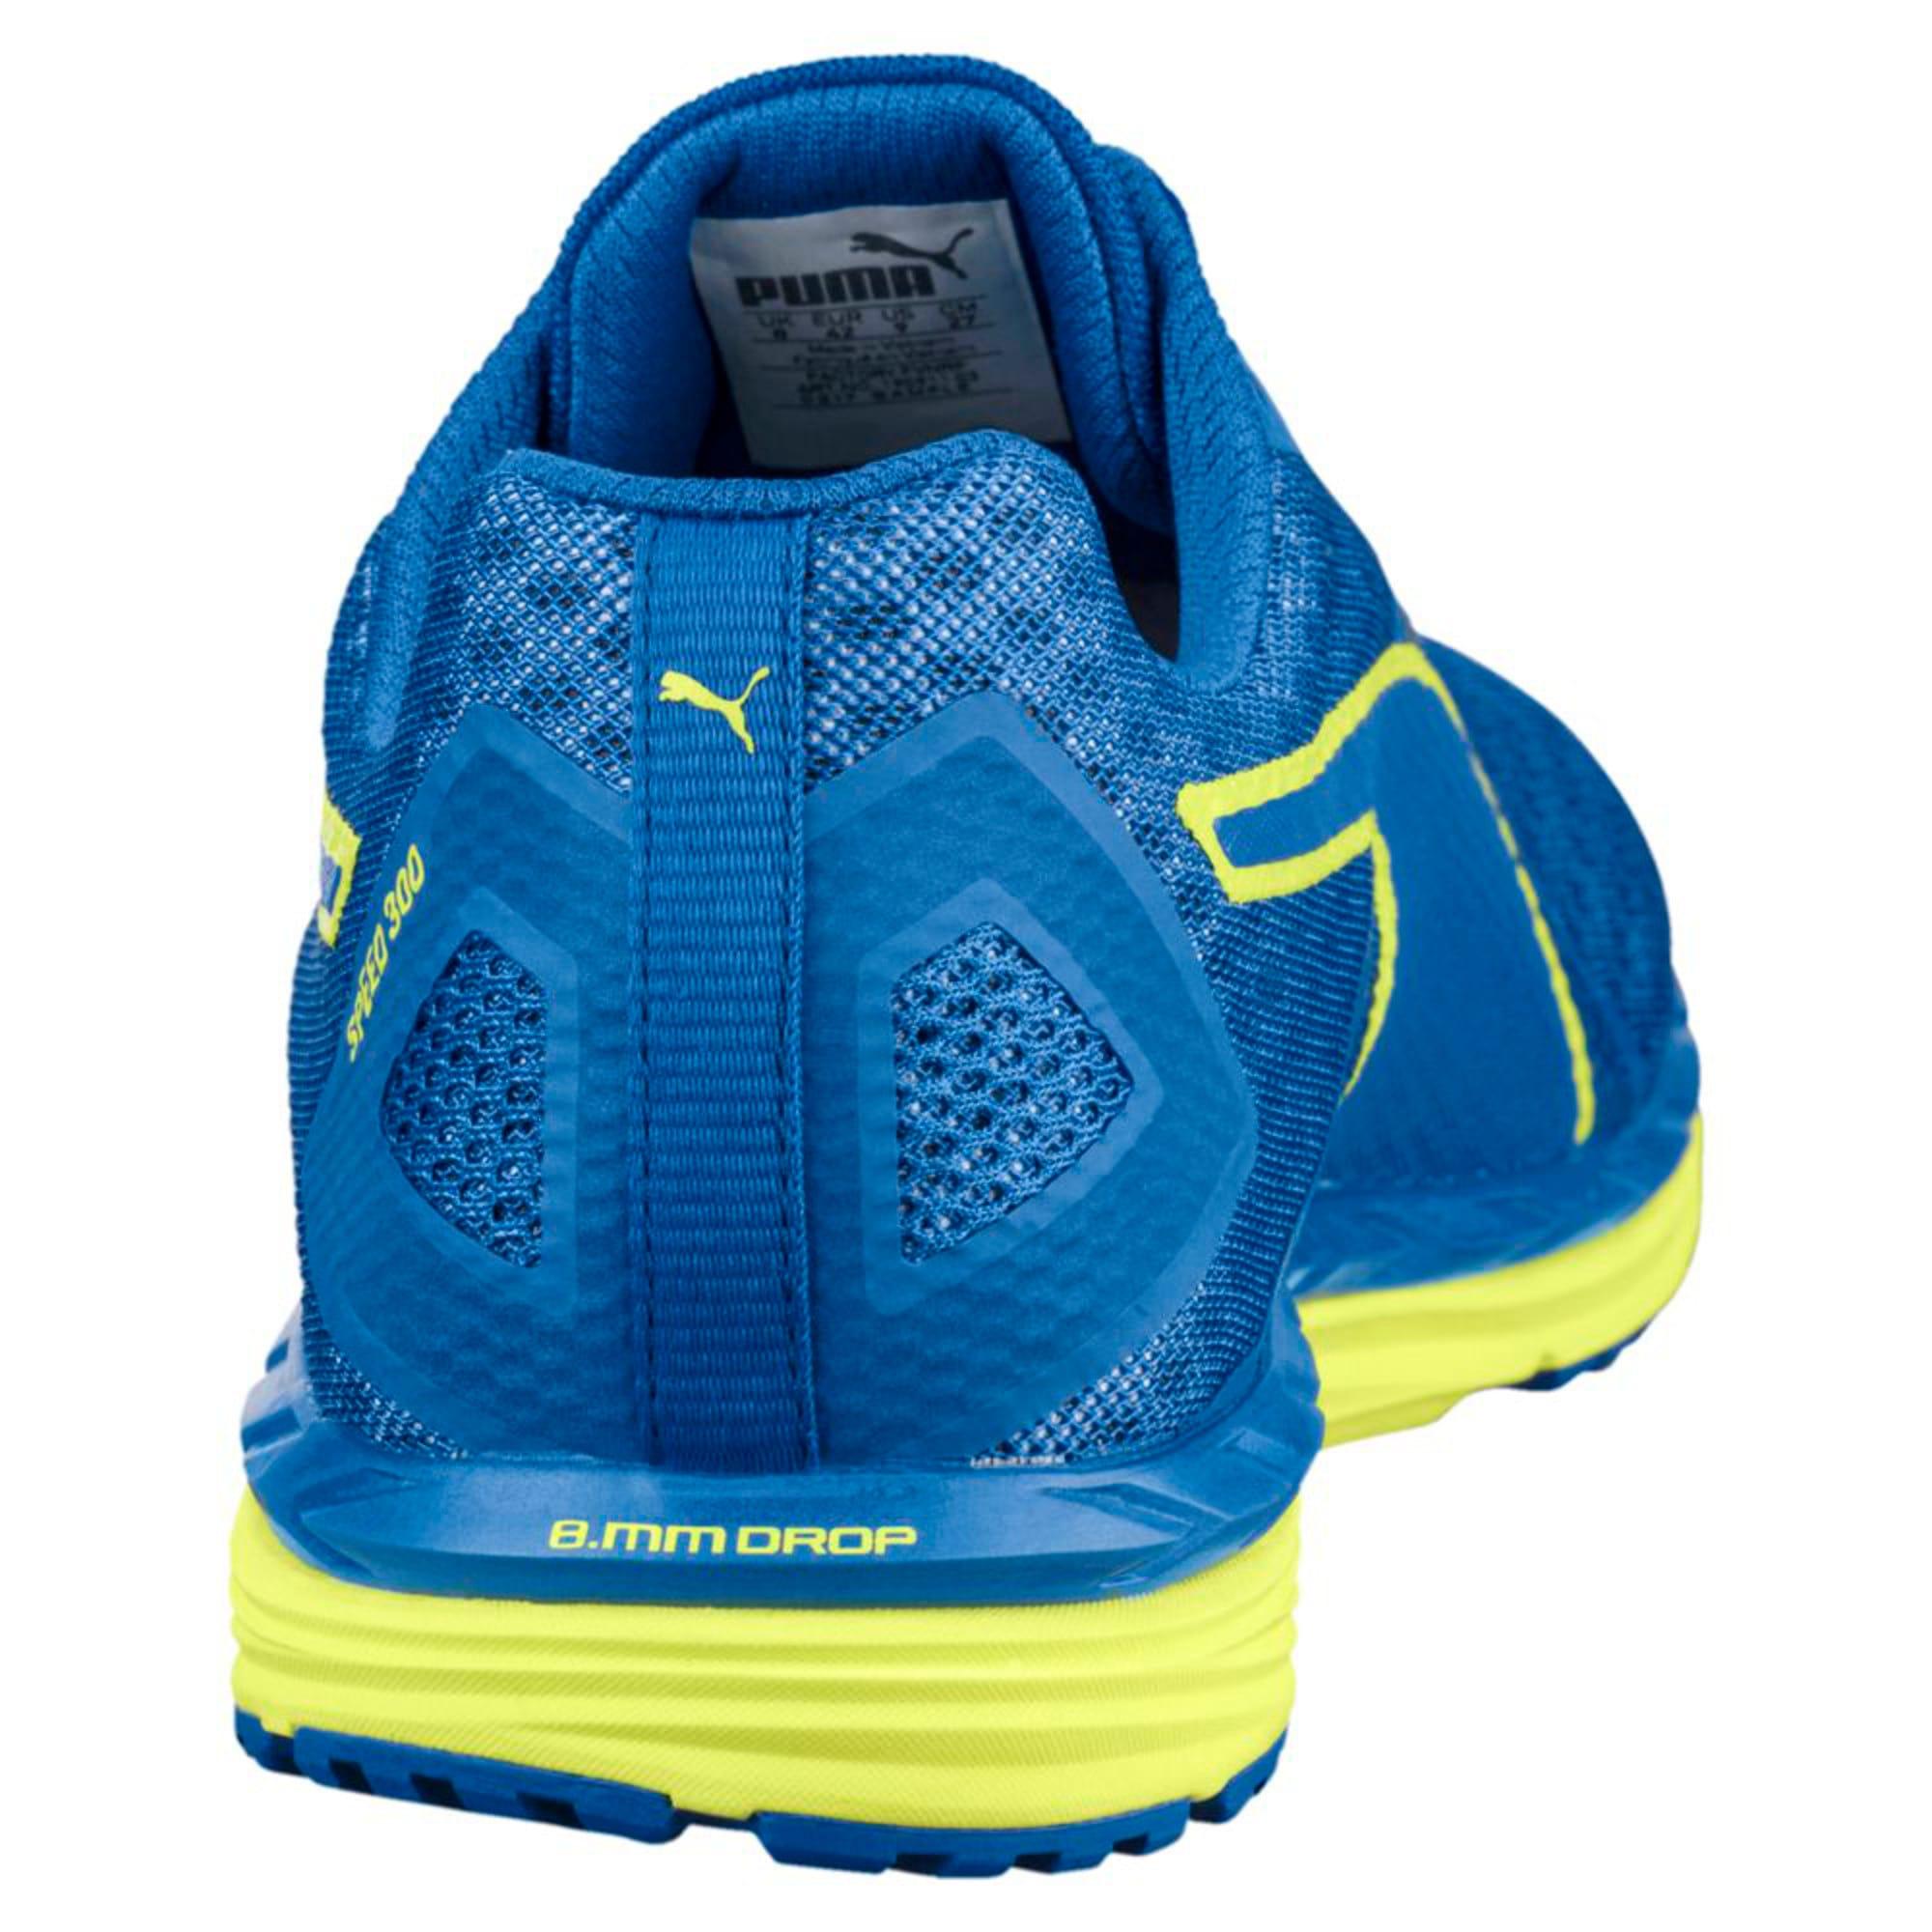 Thumbnail 4 of Speed 300 IGNITE 3 Men's Running Shoes, Turkish Sea-Peacoat-Yellow, medium-IND